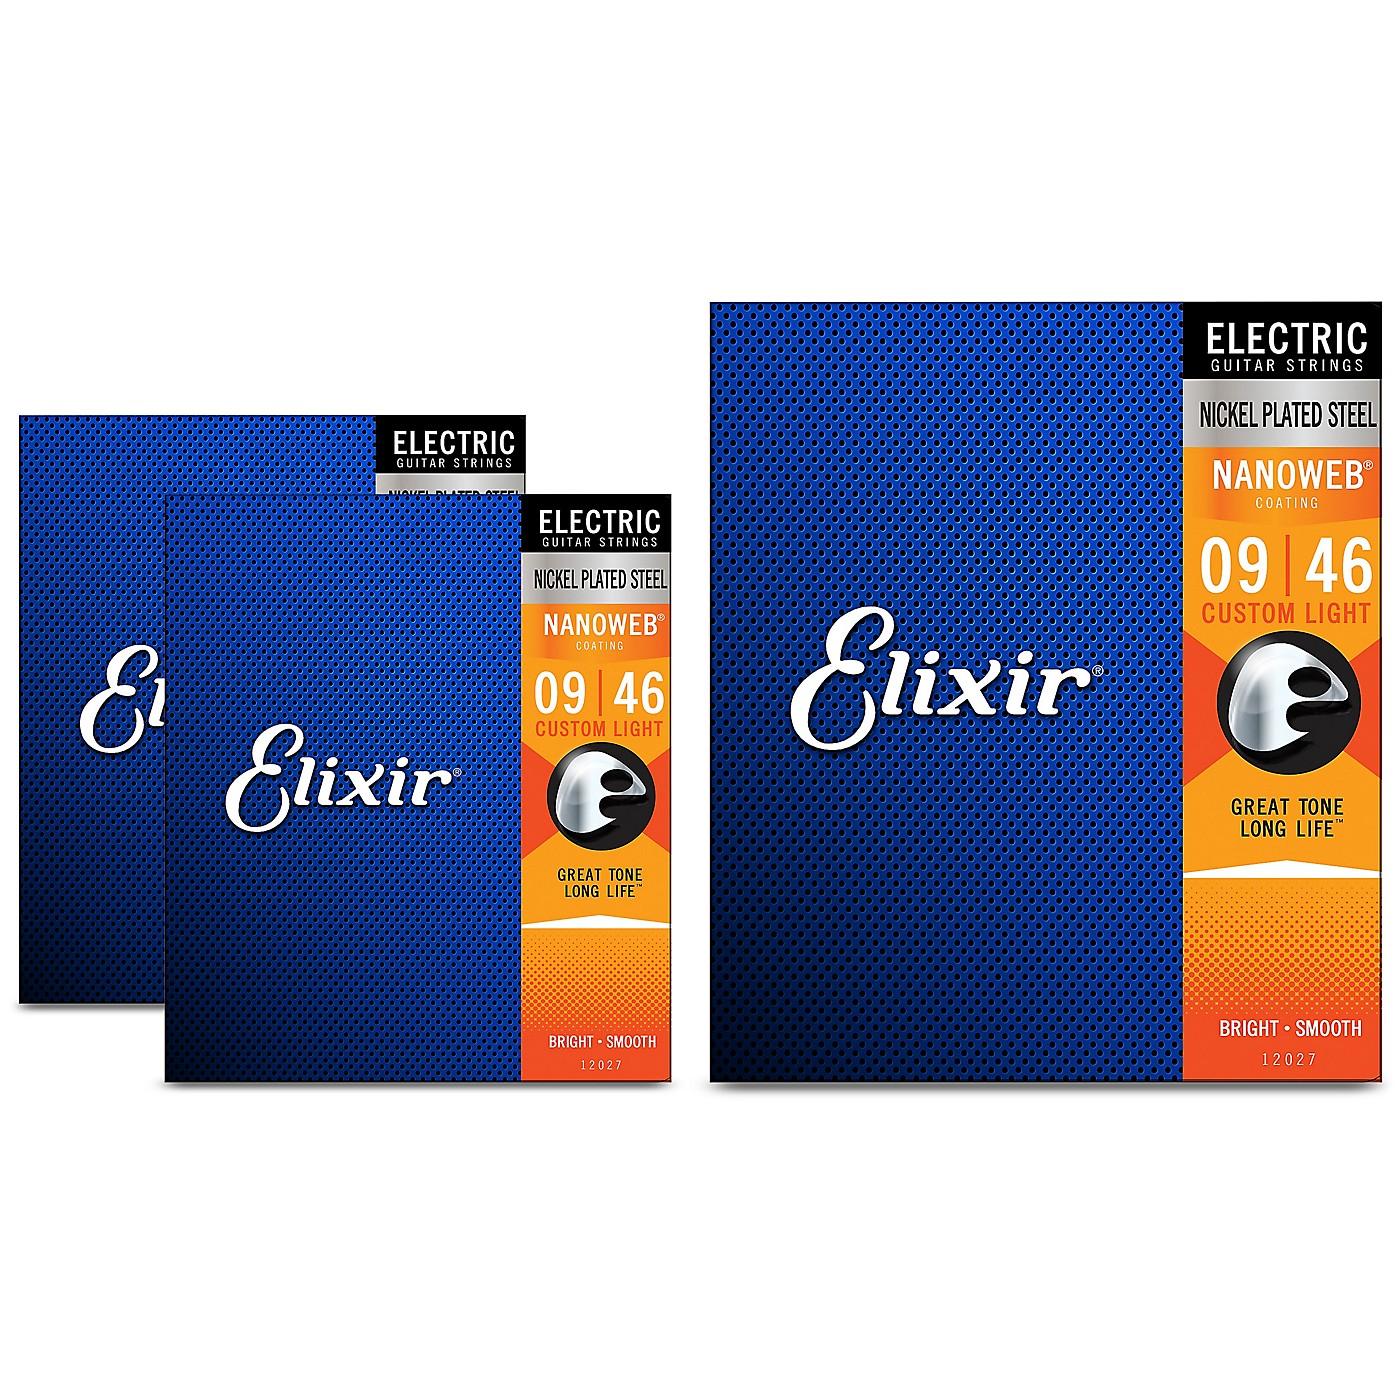 Elixir Custom Light Nanoweb Electric Guitar Strings 3 Pack thumbnail